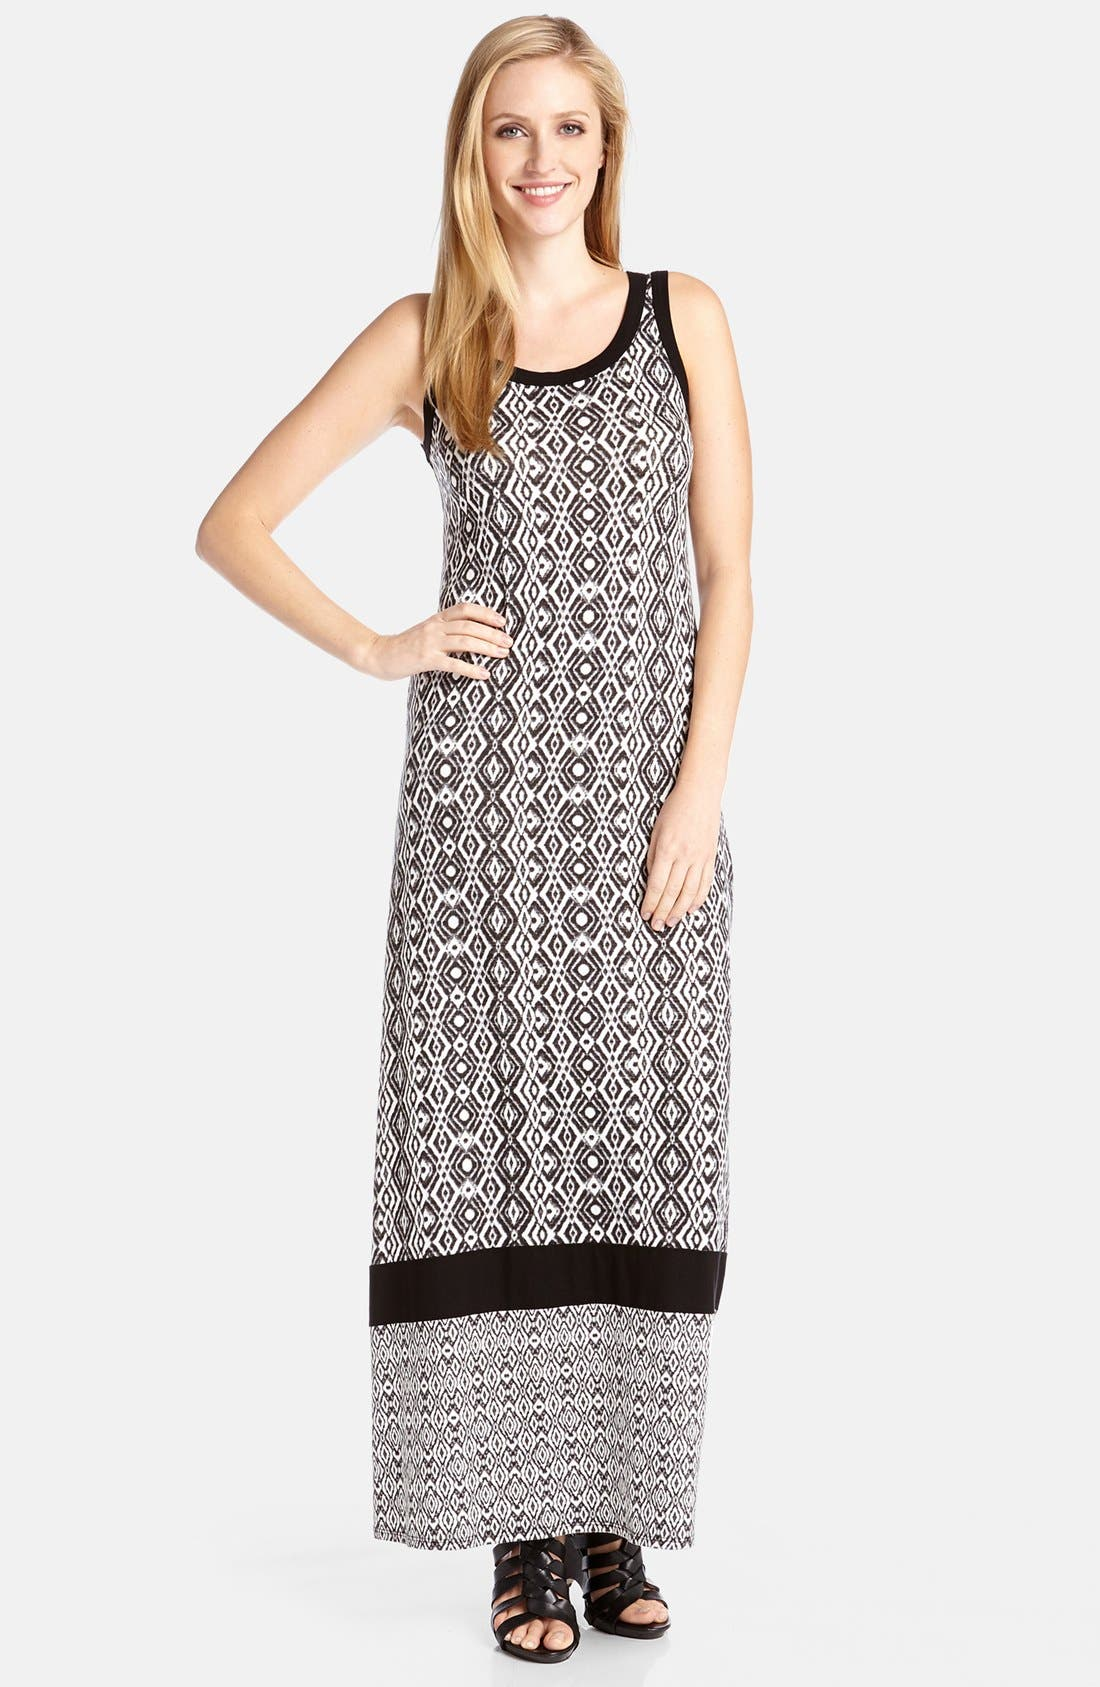 Alternate Image 1 Selected - Karen Kane Contrast Print Tank Style Maxi Dress